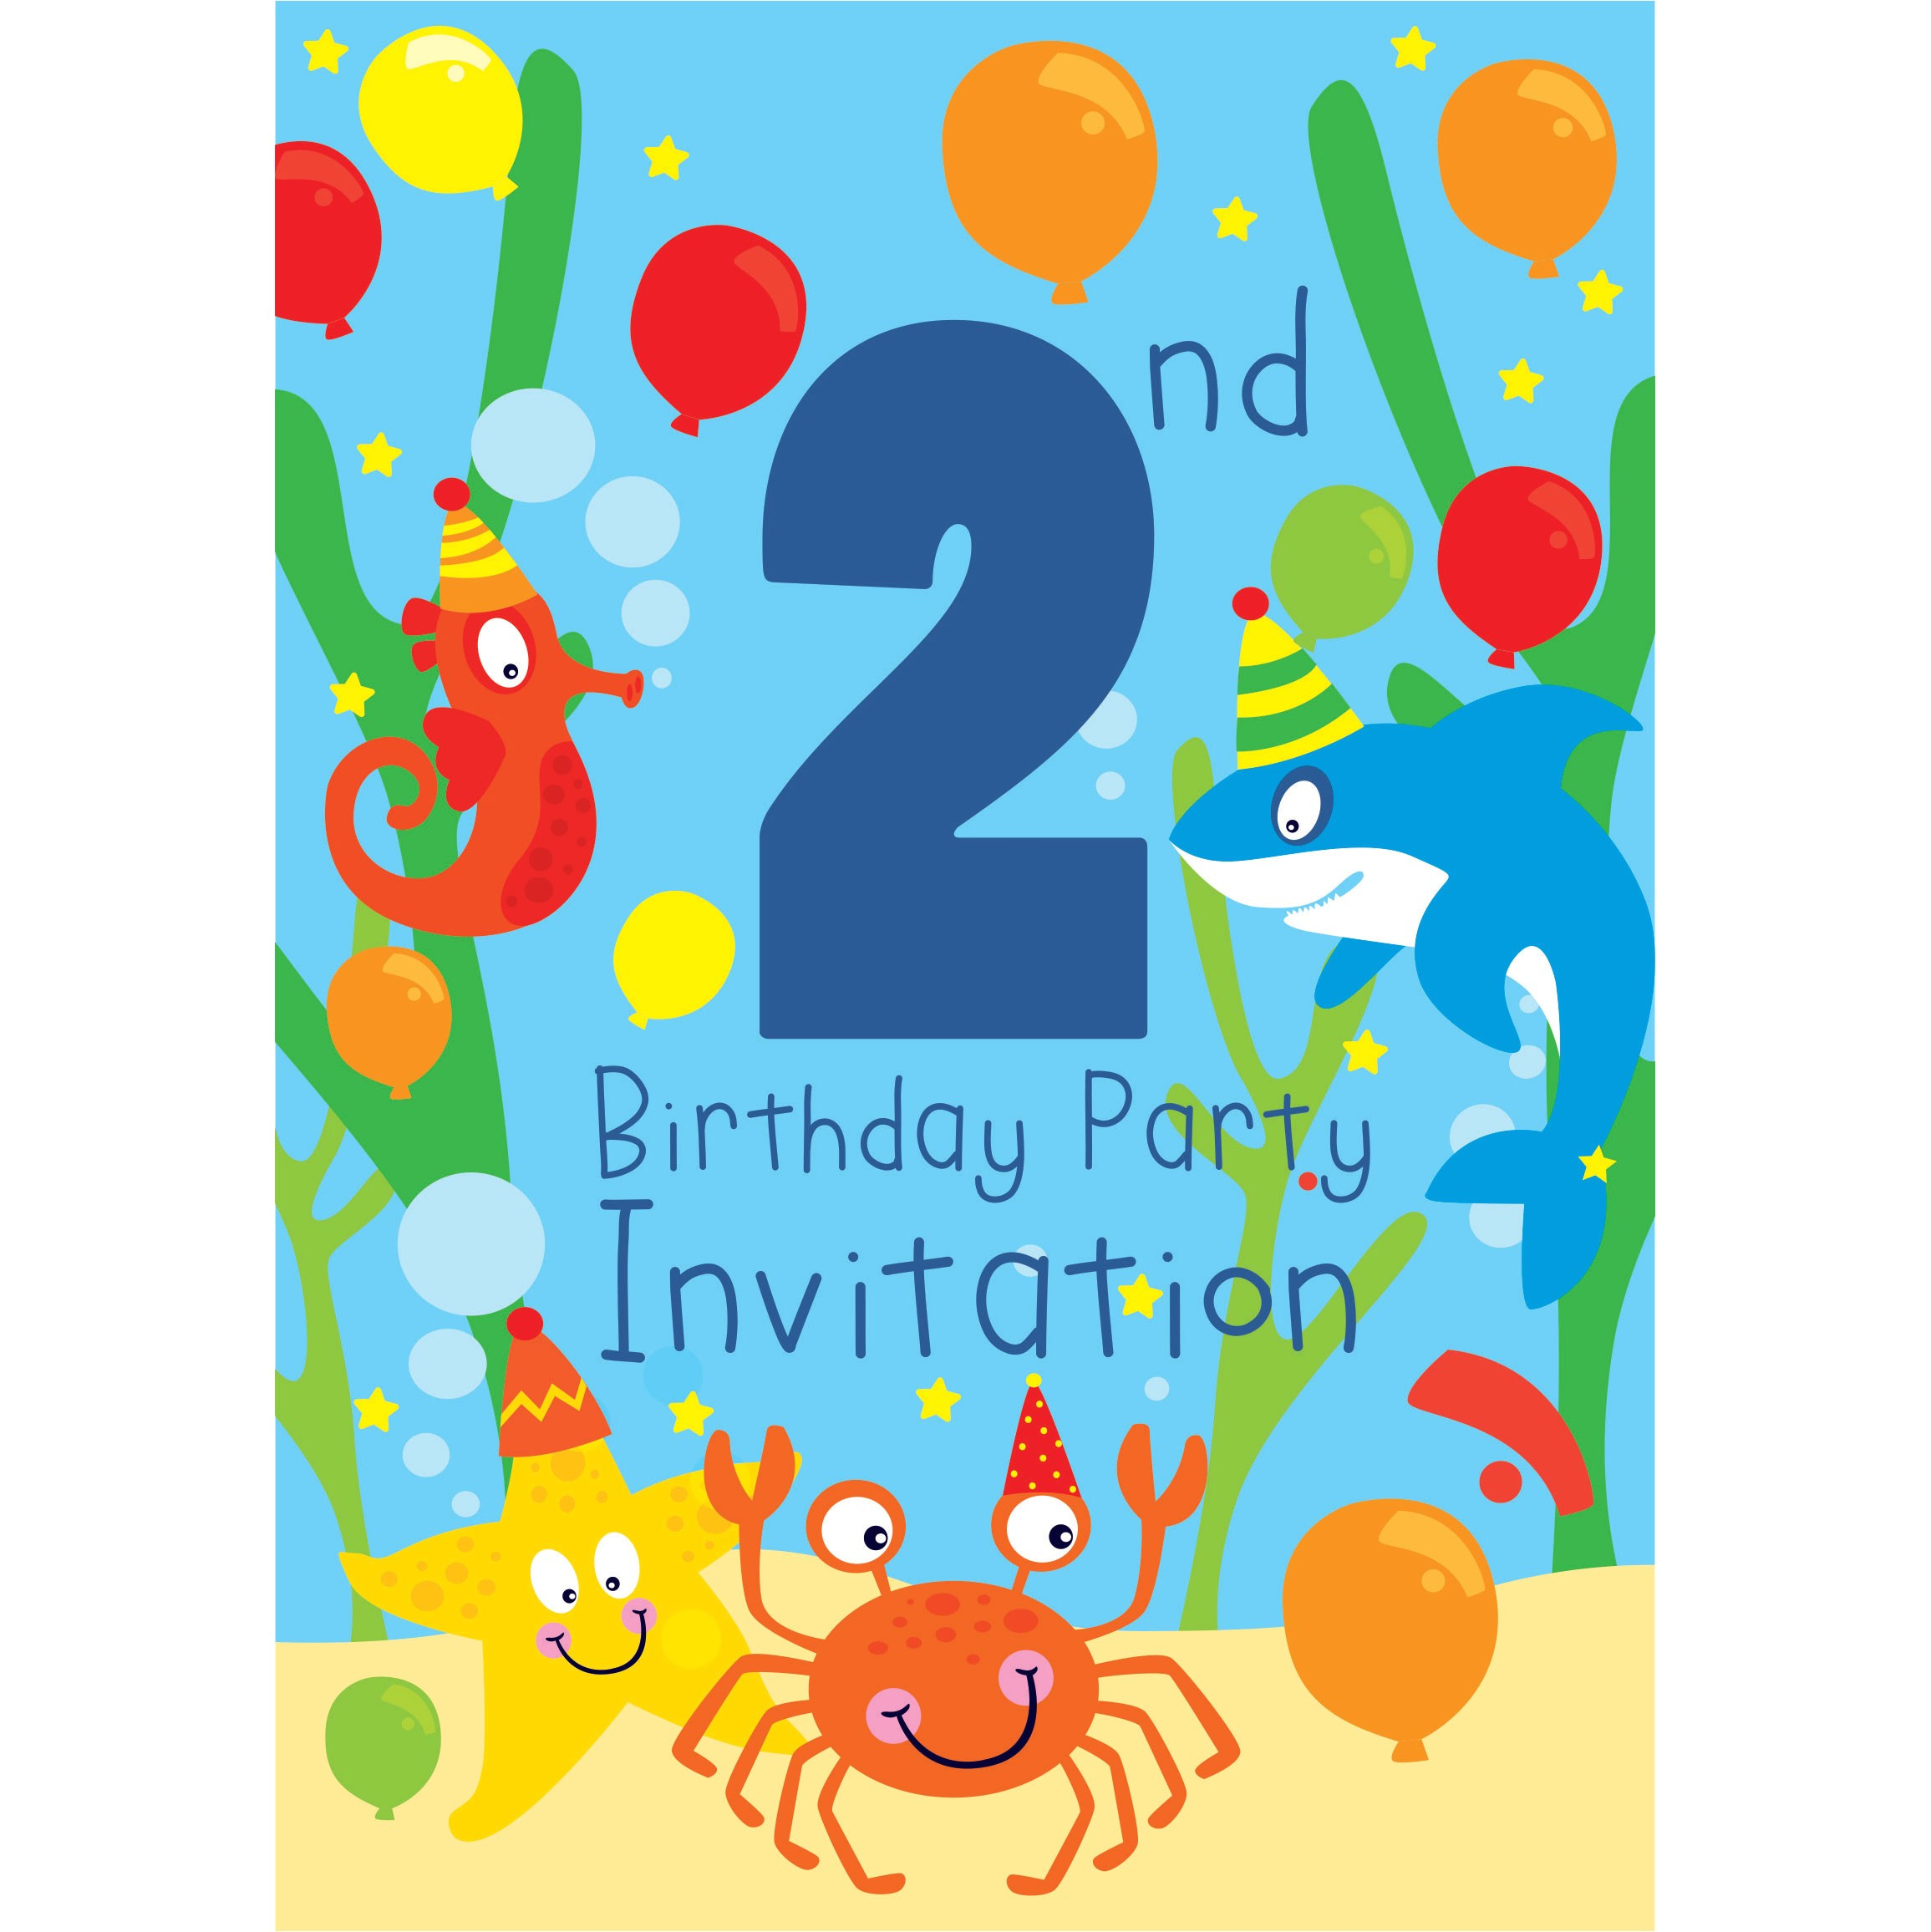 Party City Invitations for Birthdays Birthday Invitations Party City Auto Design Tech